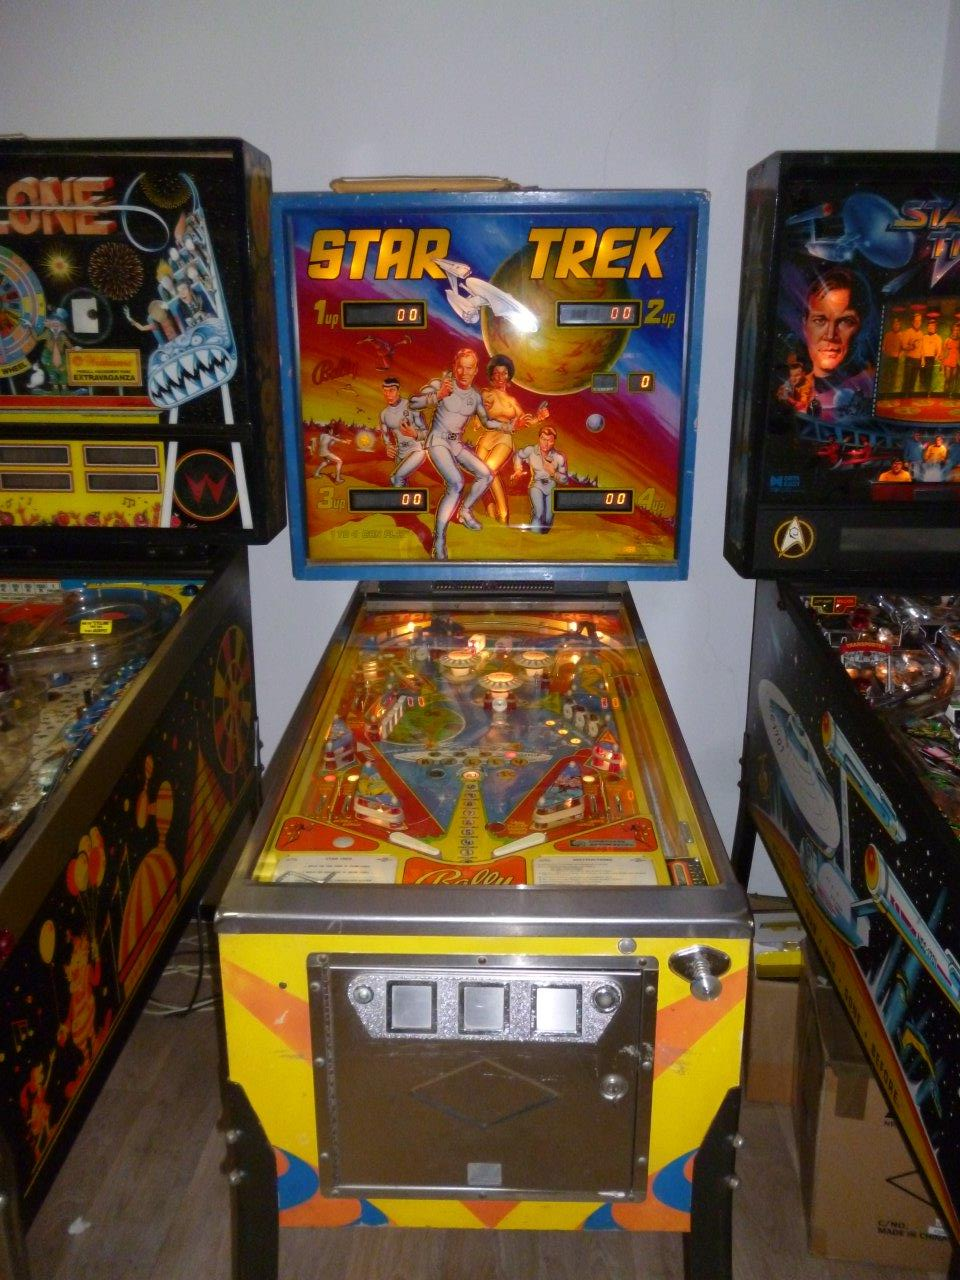 Star Trek   Bally   flipperkast